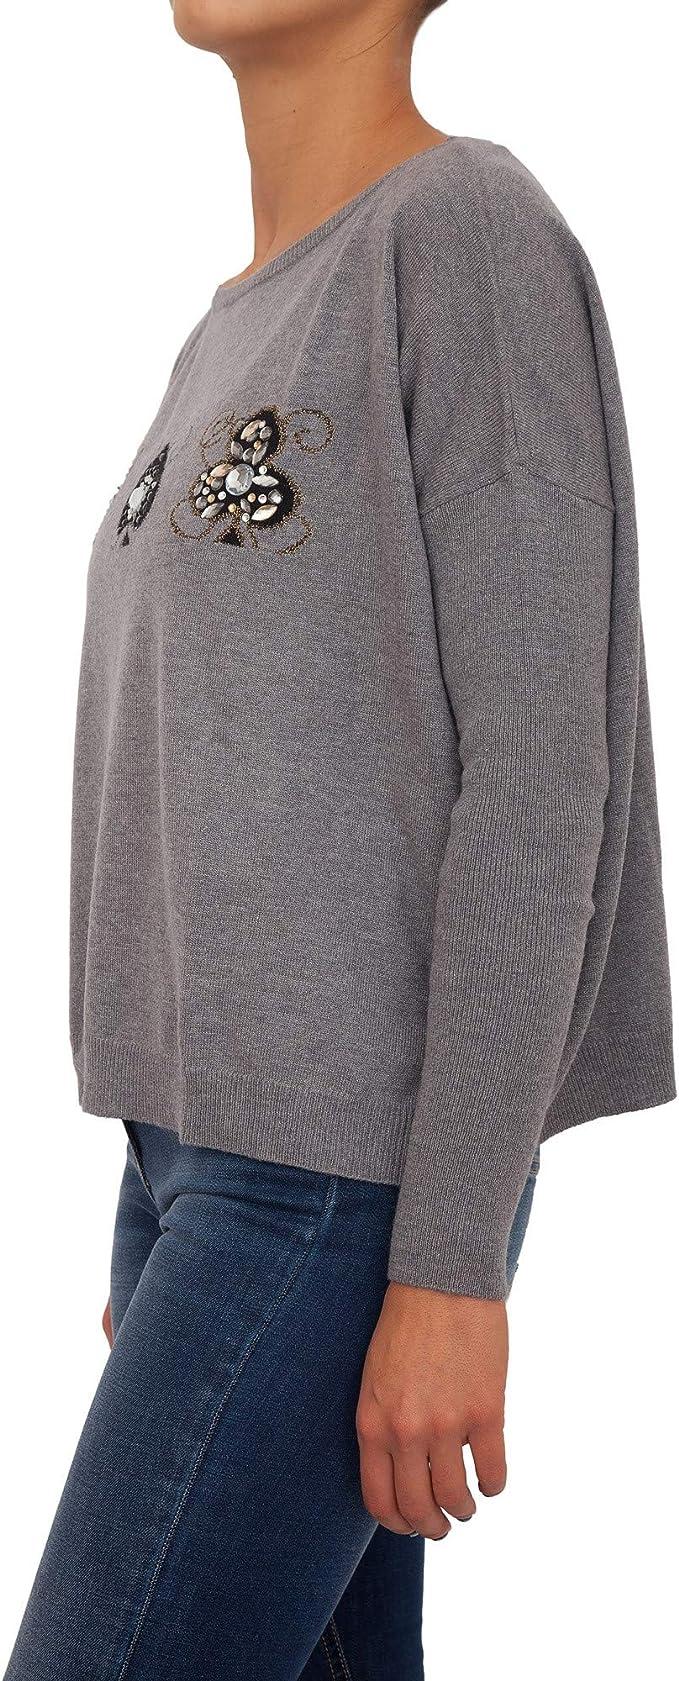 Madonna donna CARDIGAN maglia giacca